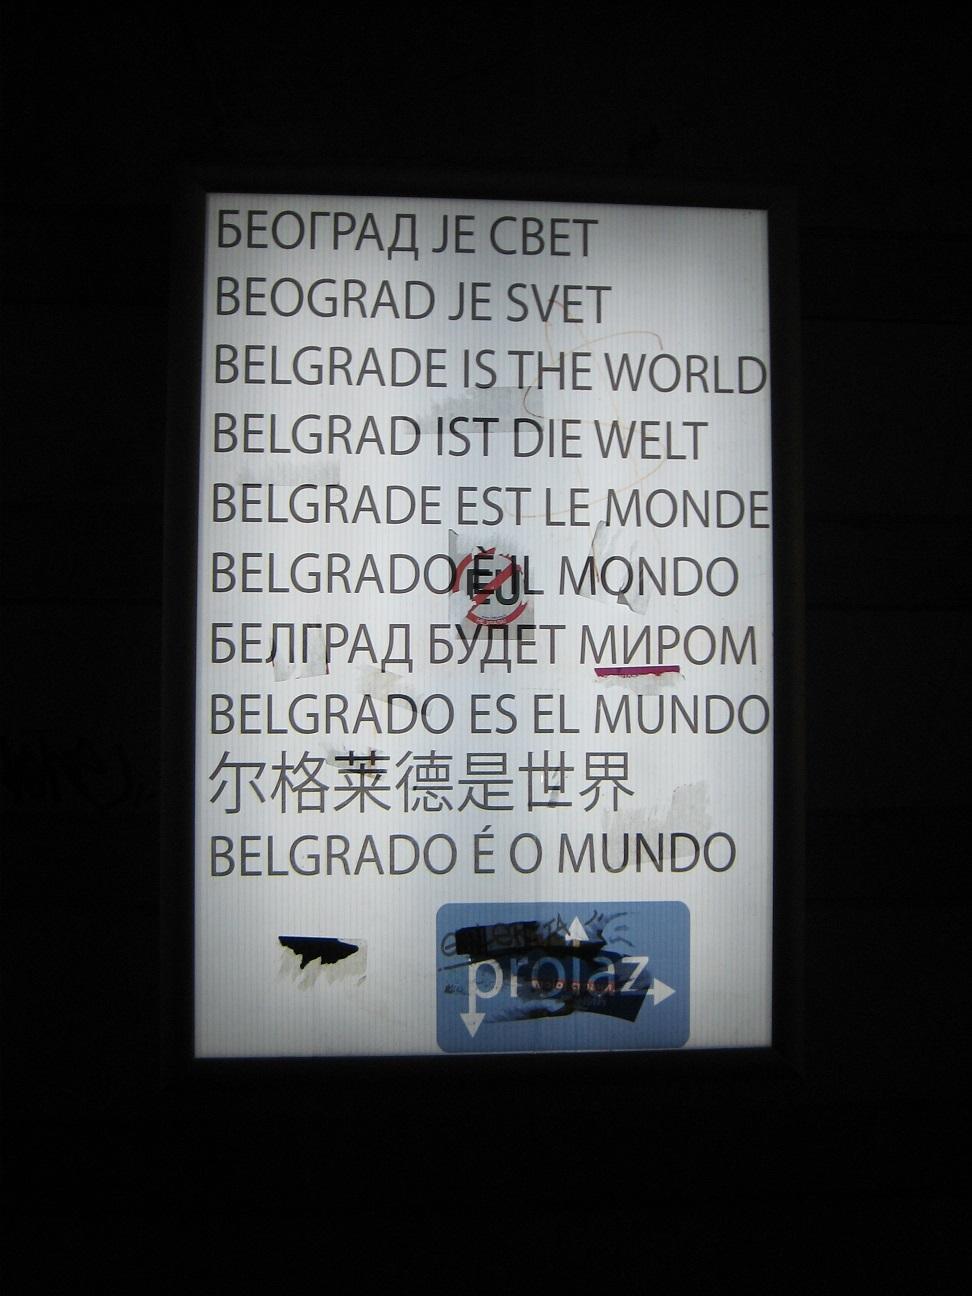 30/08/2008: Belgrade- last day